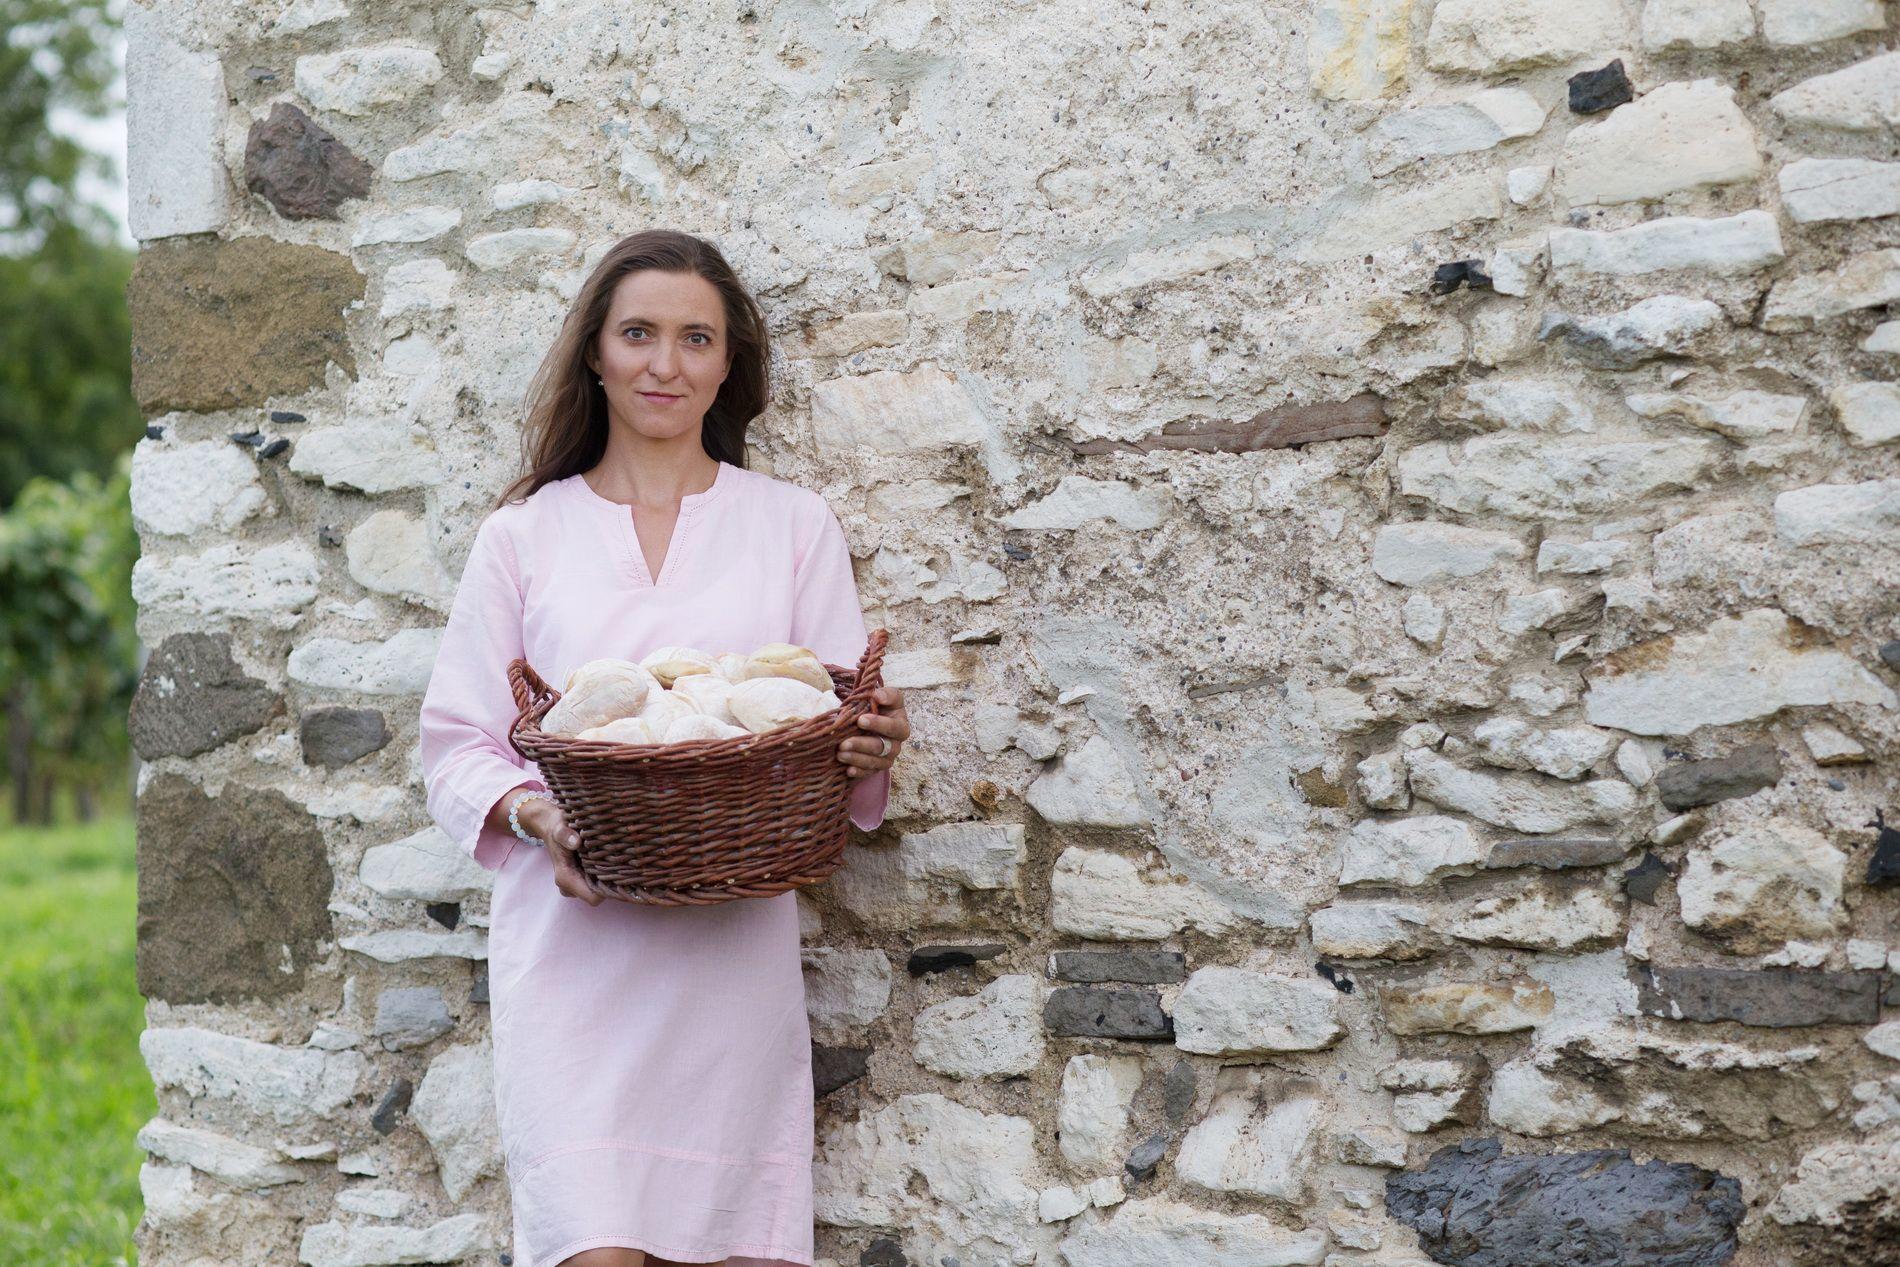 A legfinomabb balatoni kenyér titka